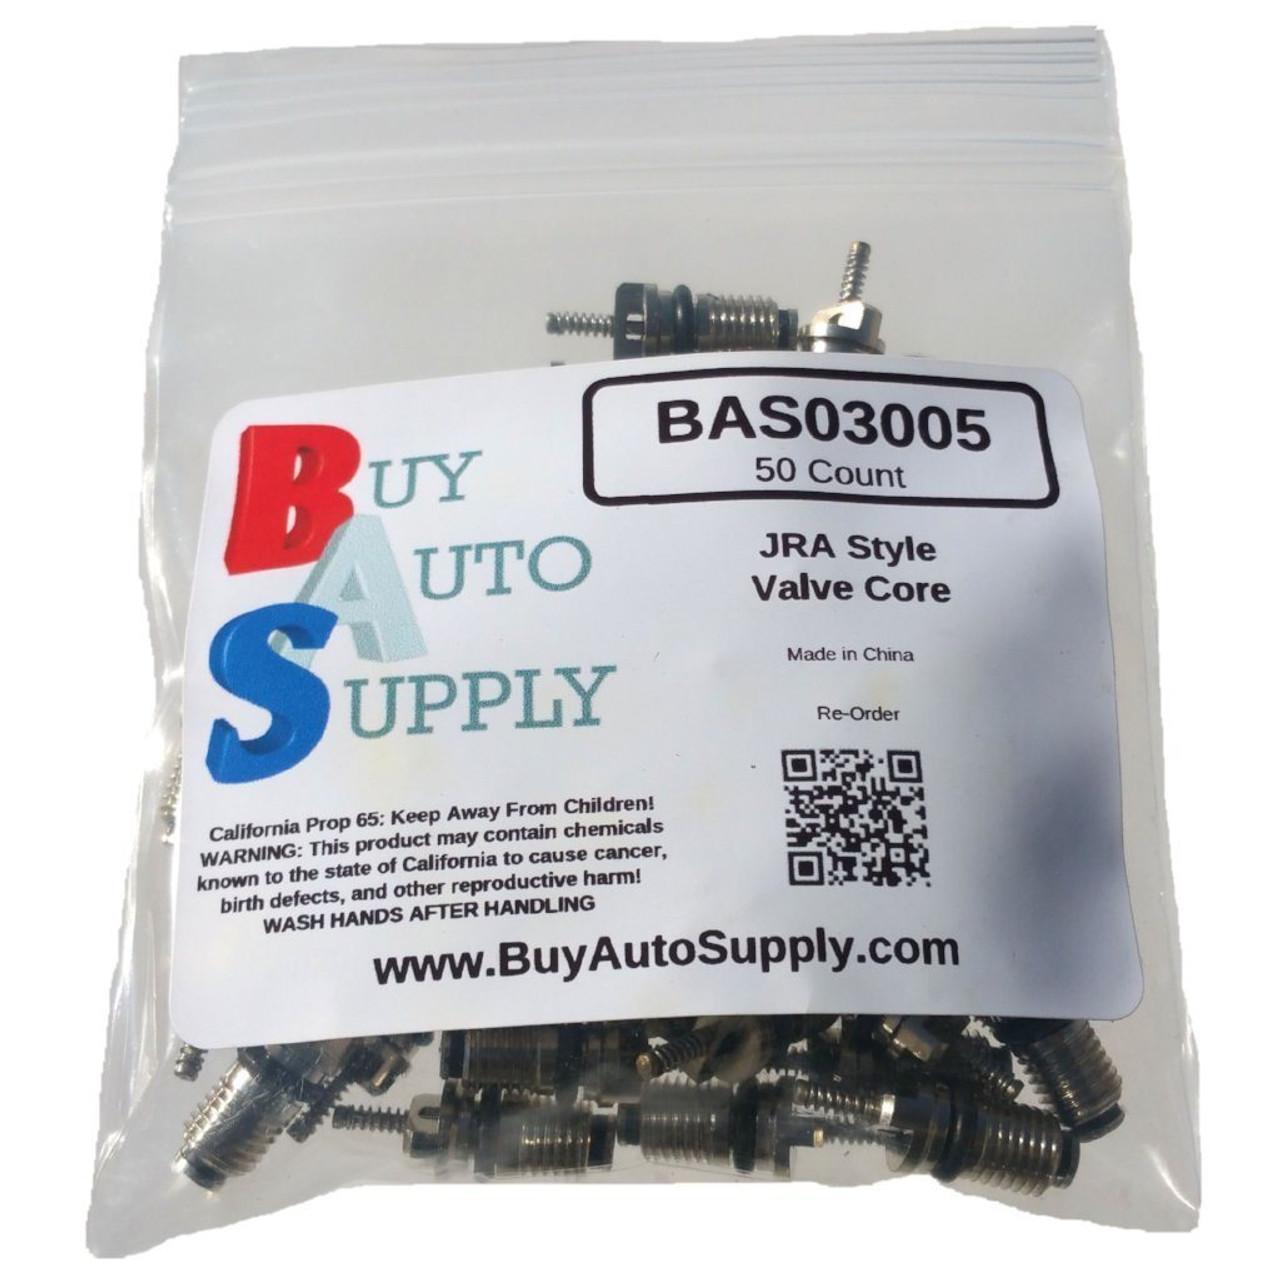 Bag of 50 JRA A/C Schrader Valve Core - BAS03005 - Interchange - 409914, FJC-2674, 59347, Delco 15-75234, MT0059